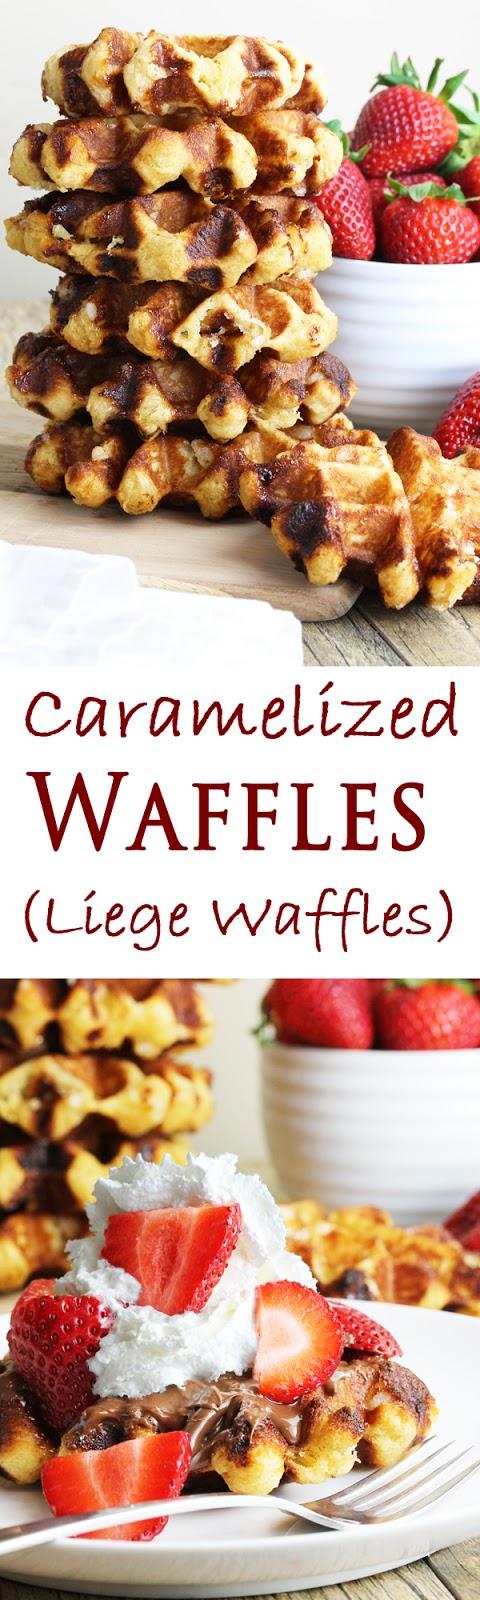 Caramelized Waffles (Liege Waffles)